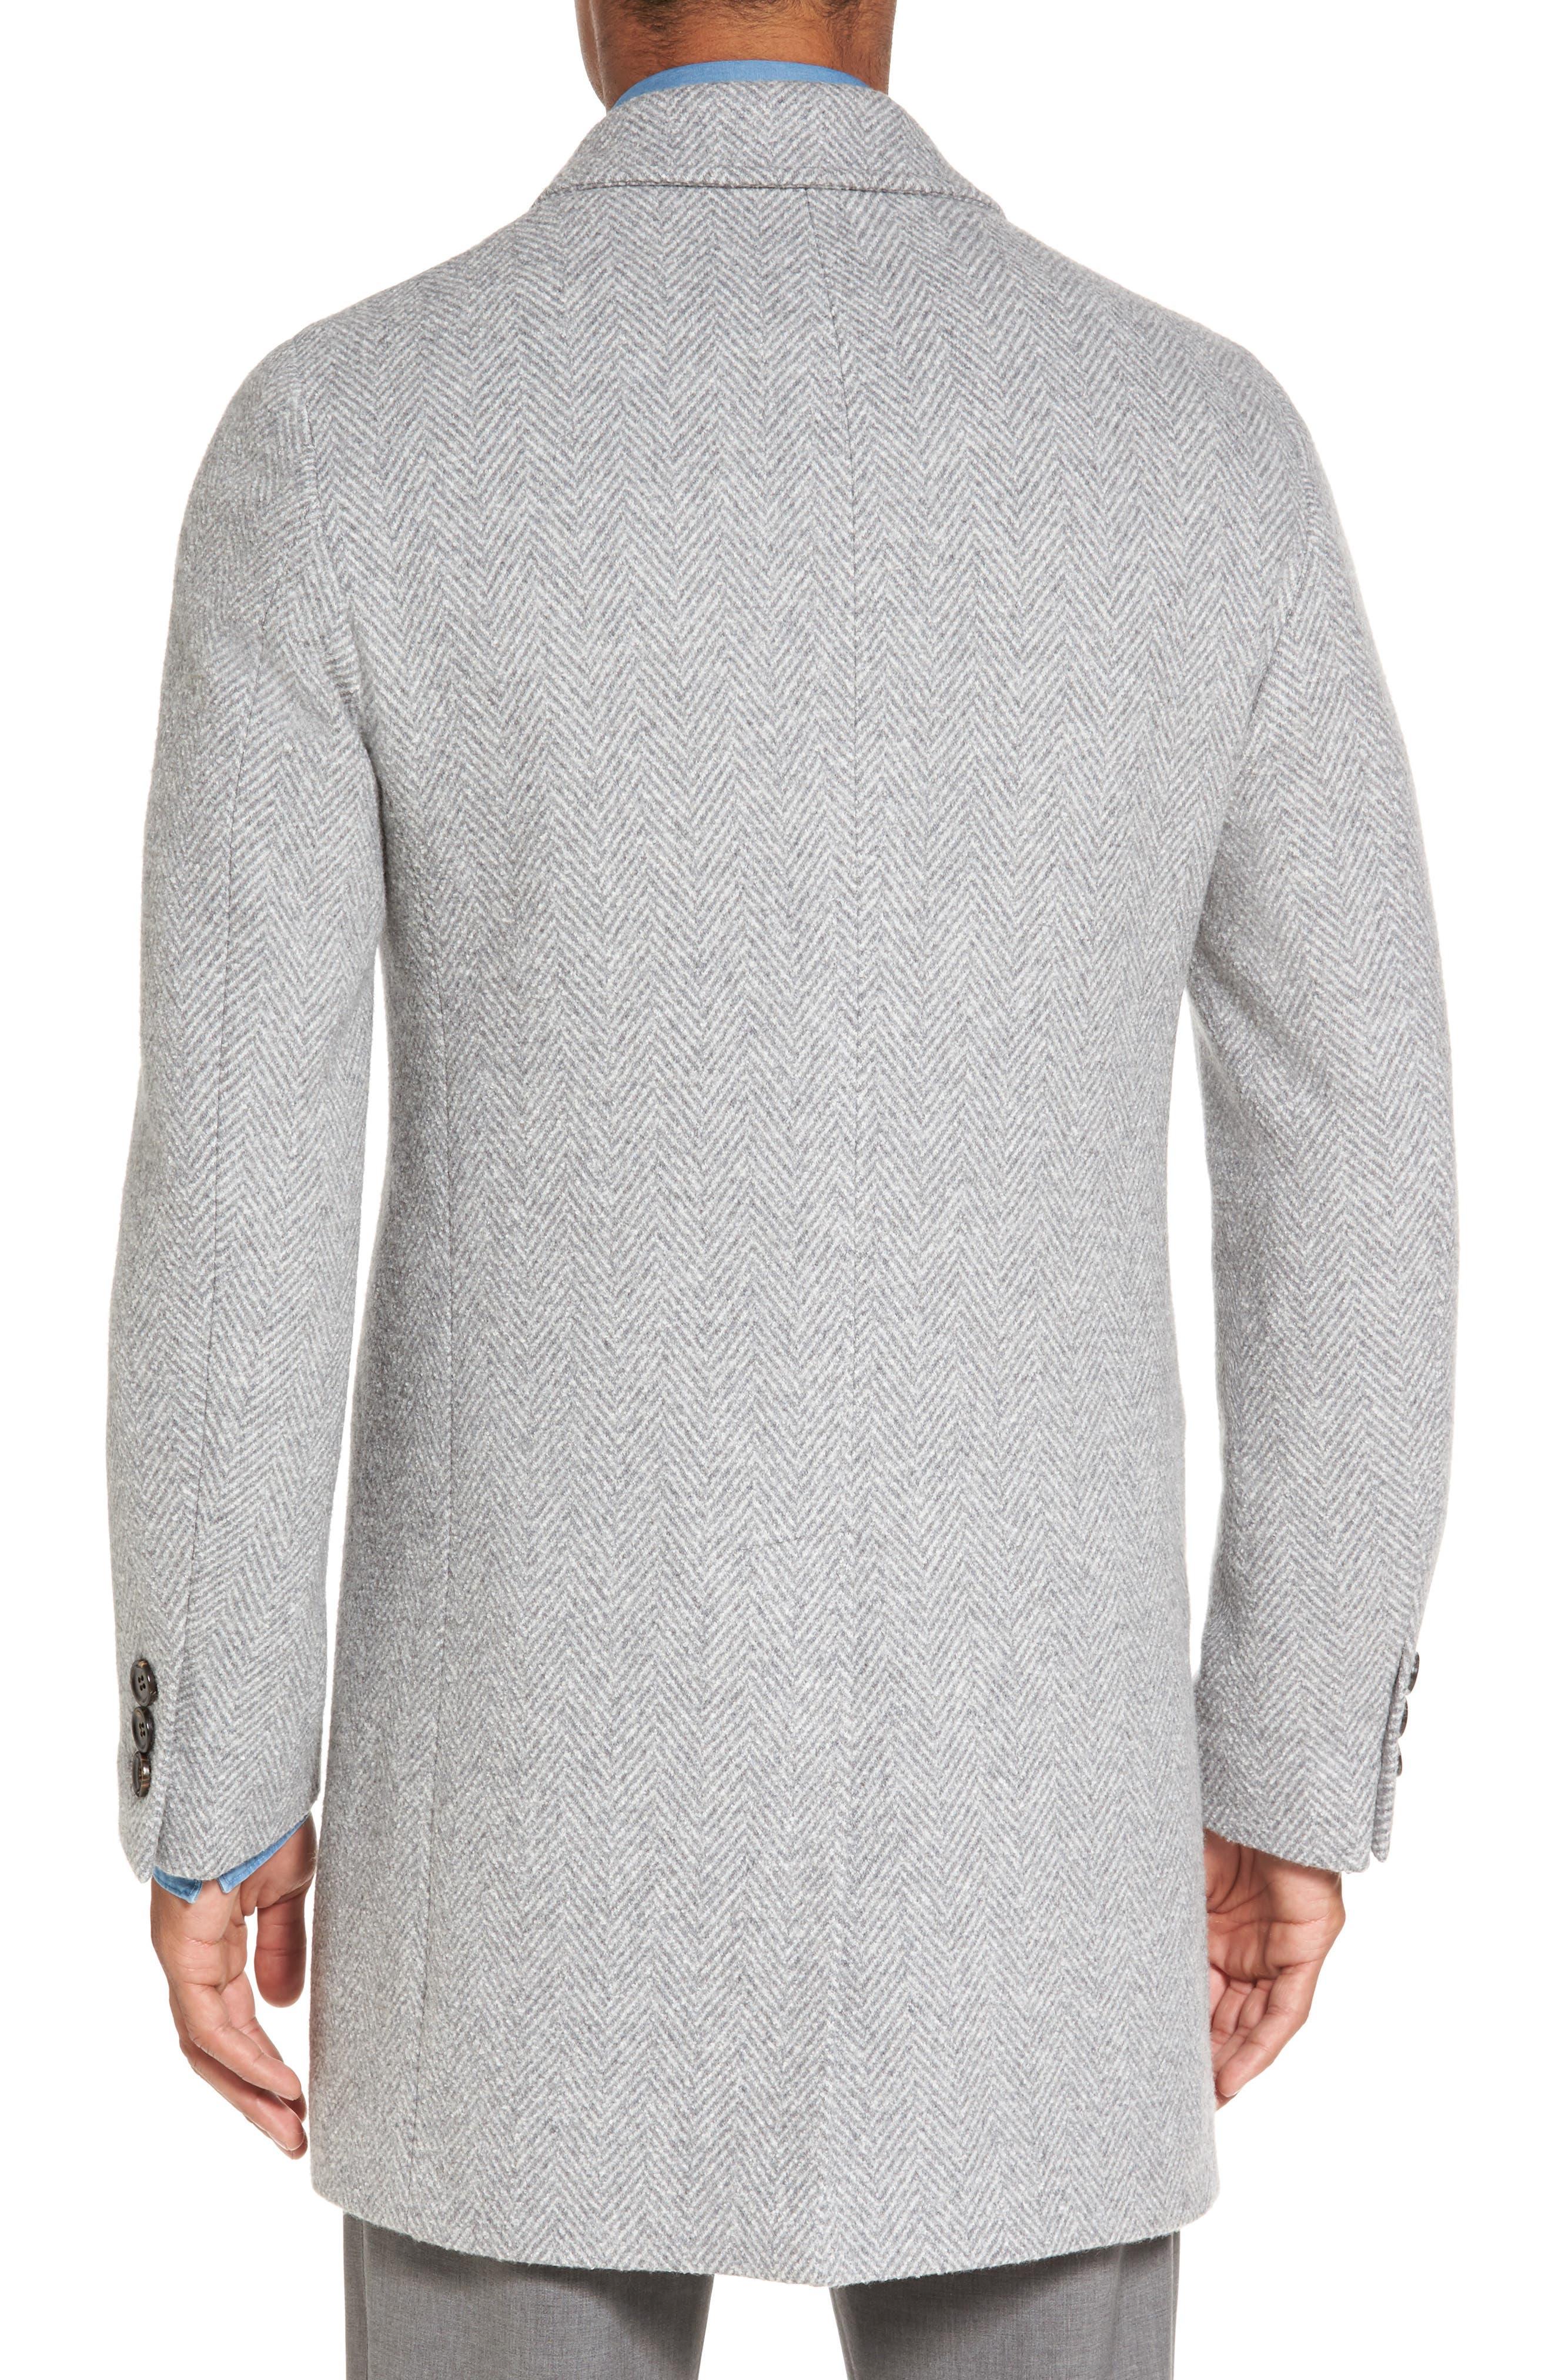 Herringbone Wool Blend Overcoat,                             Alternate thumbnail 2, color,